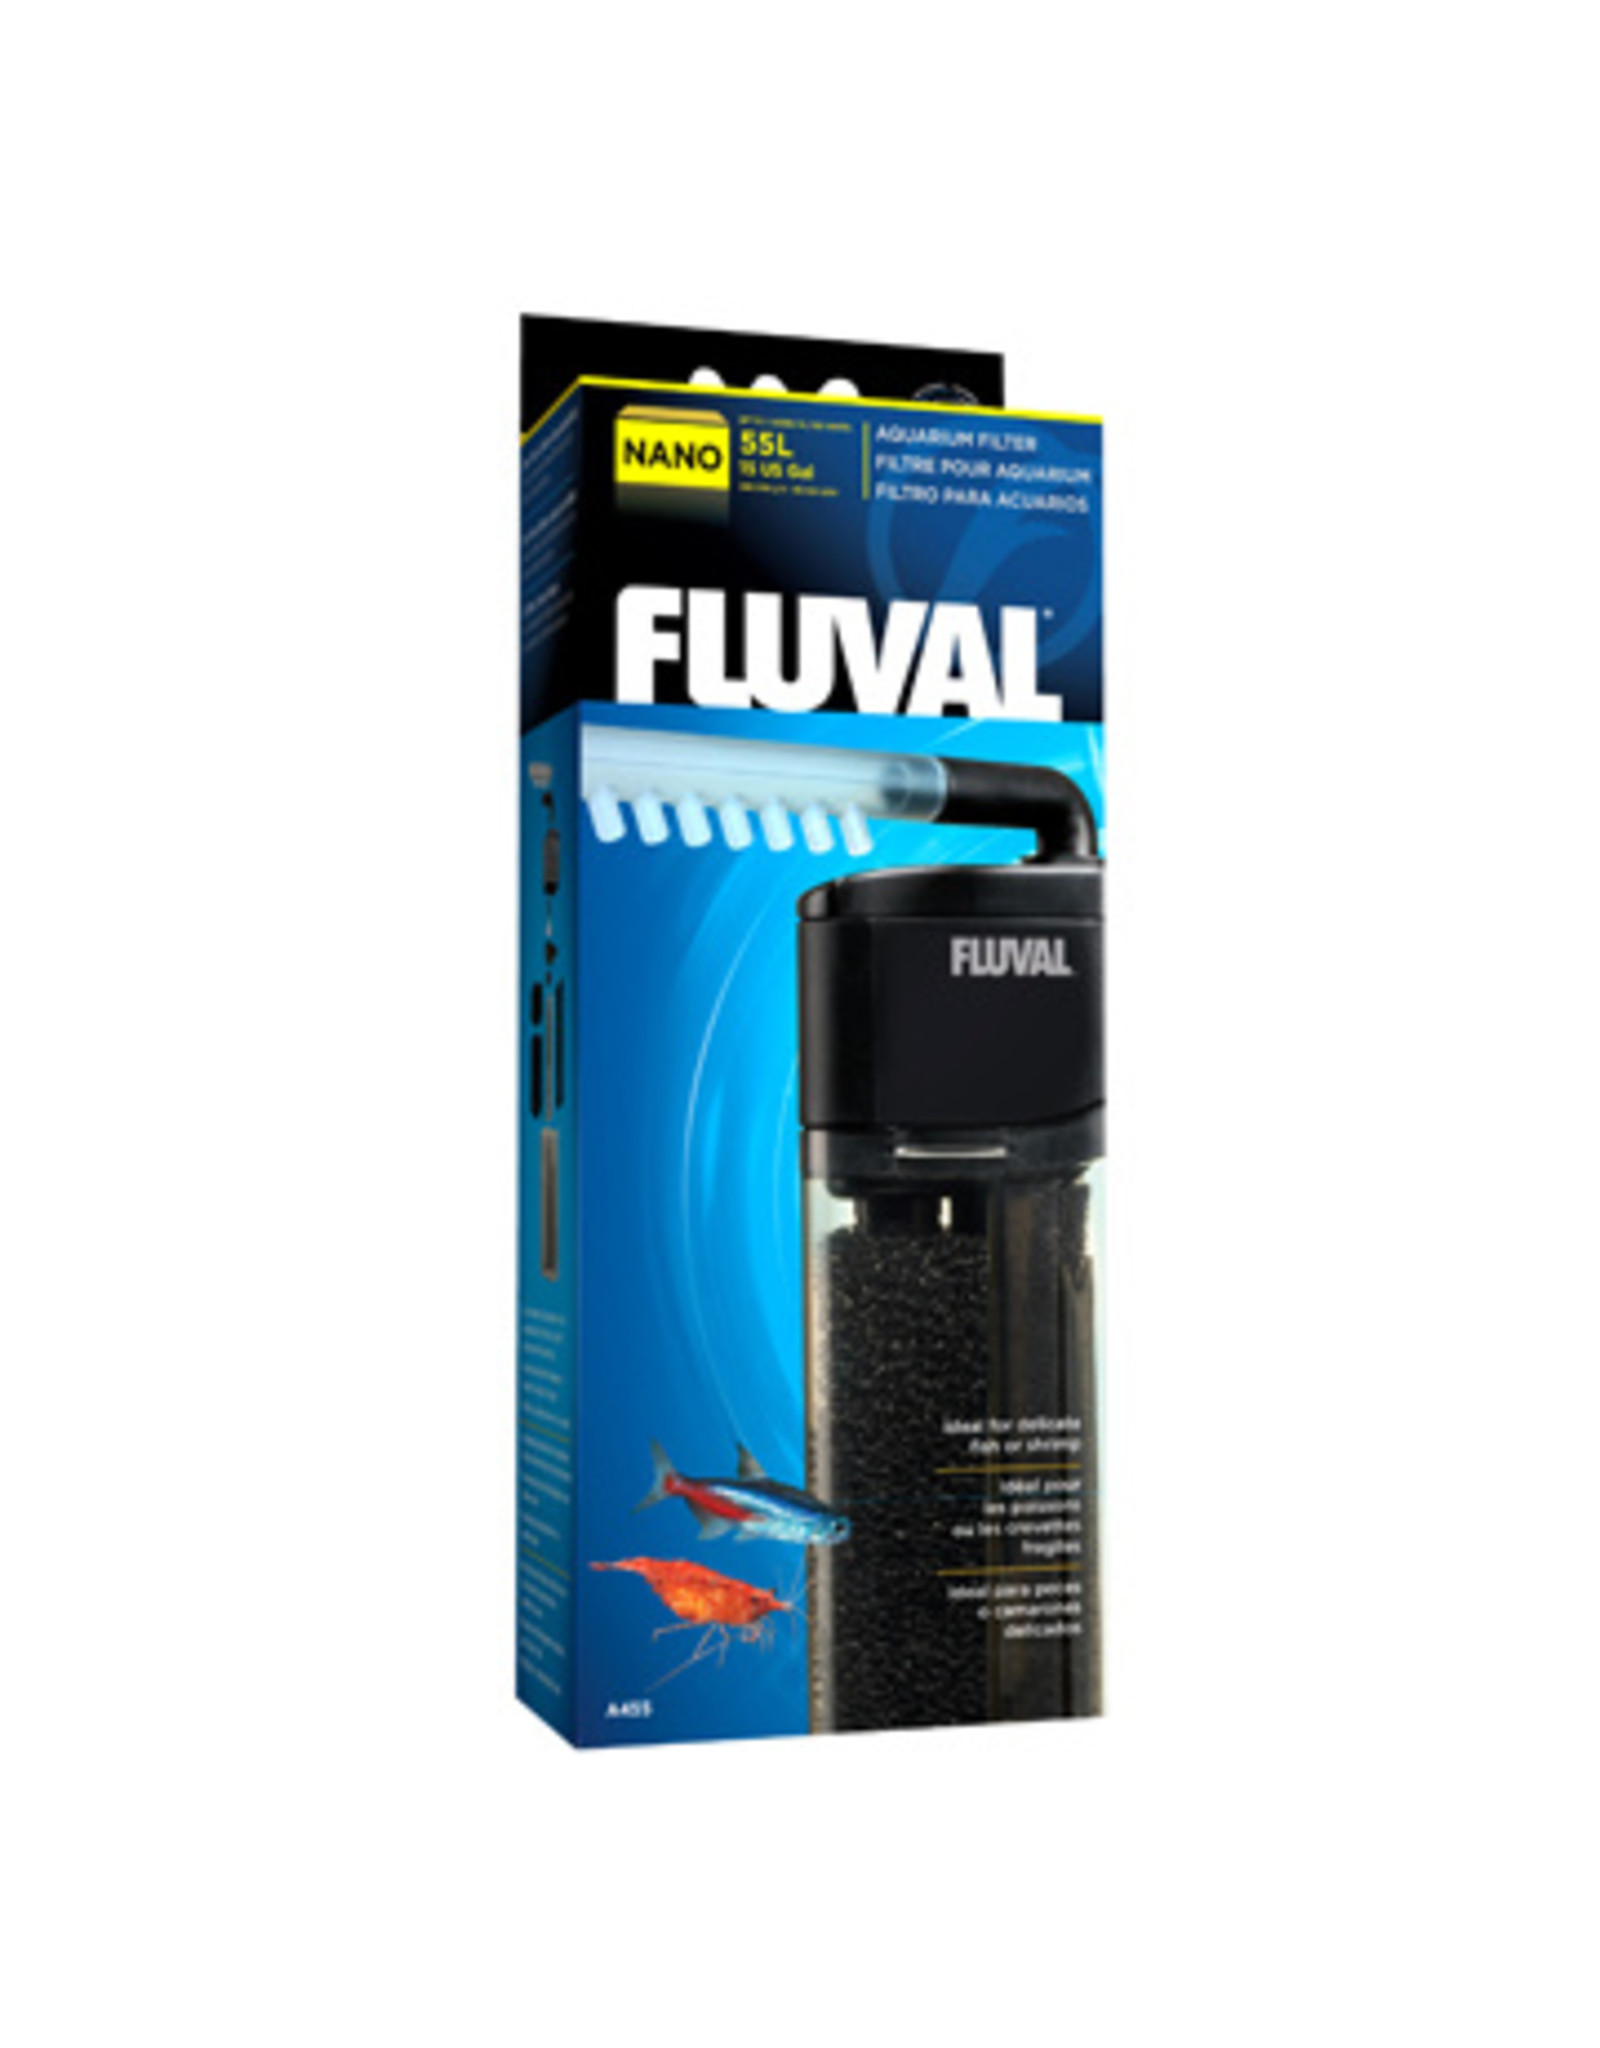 Fluval FLUVAL Nano Aquarium Filter